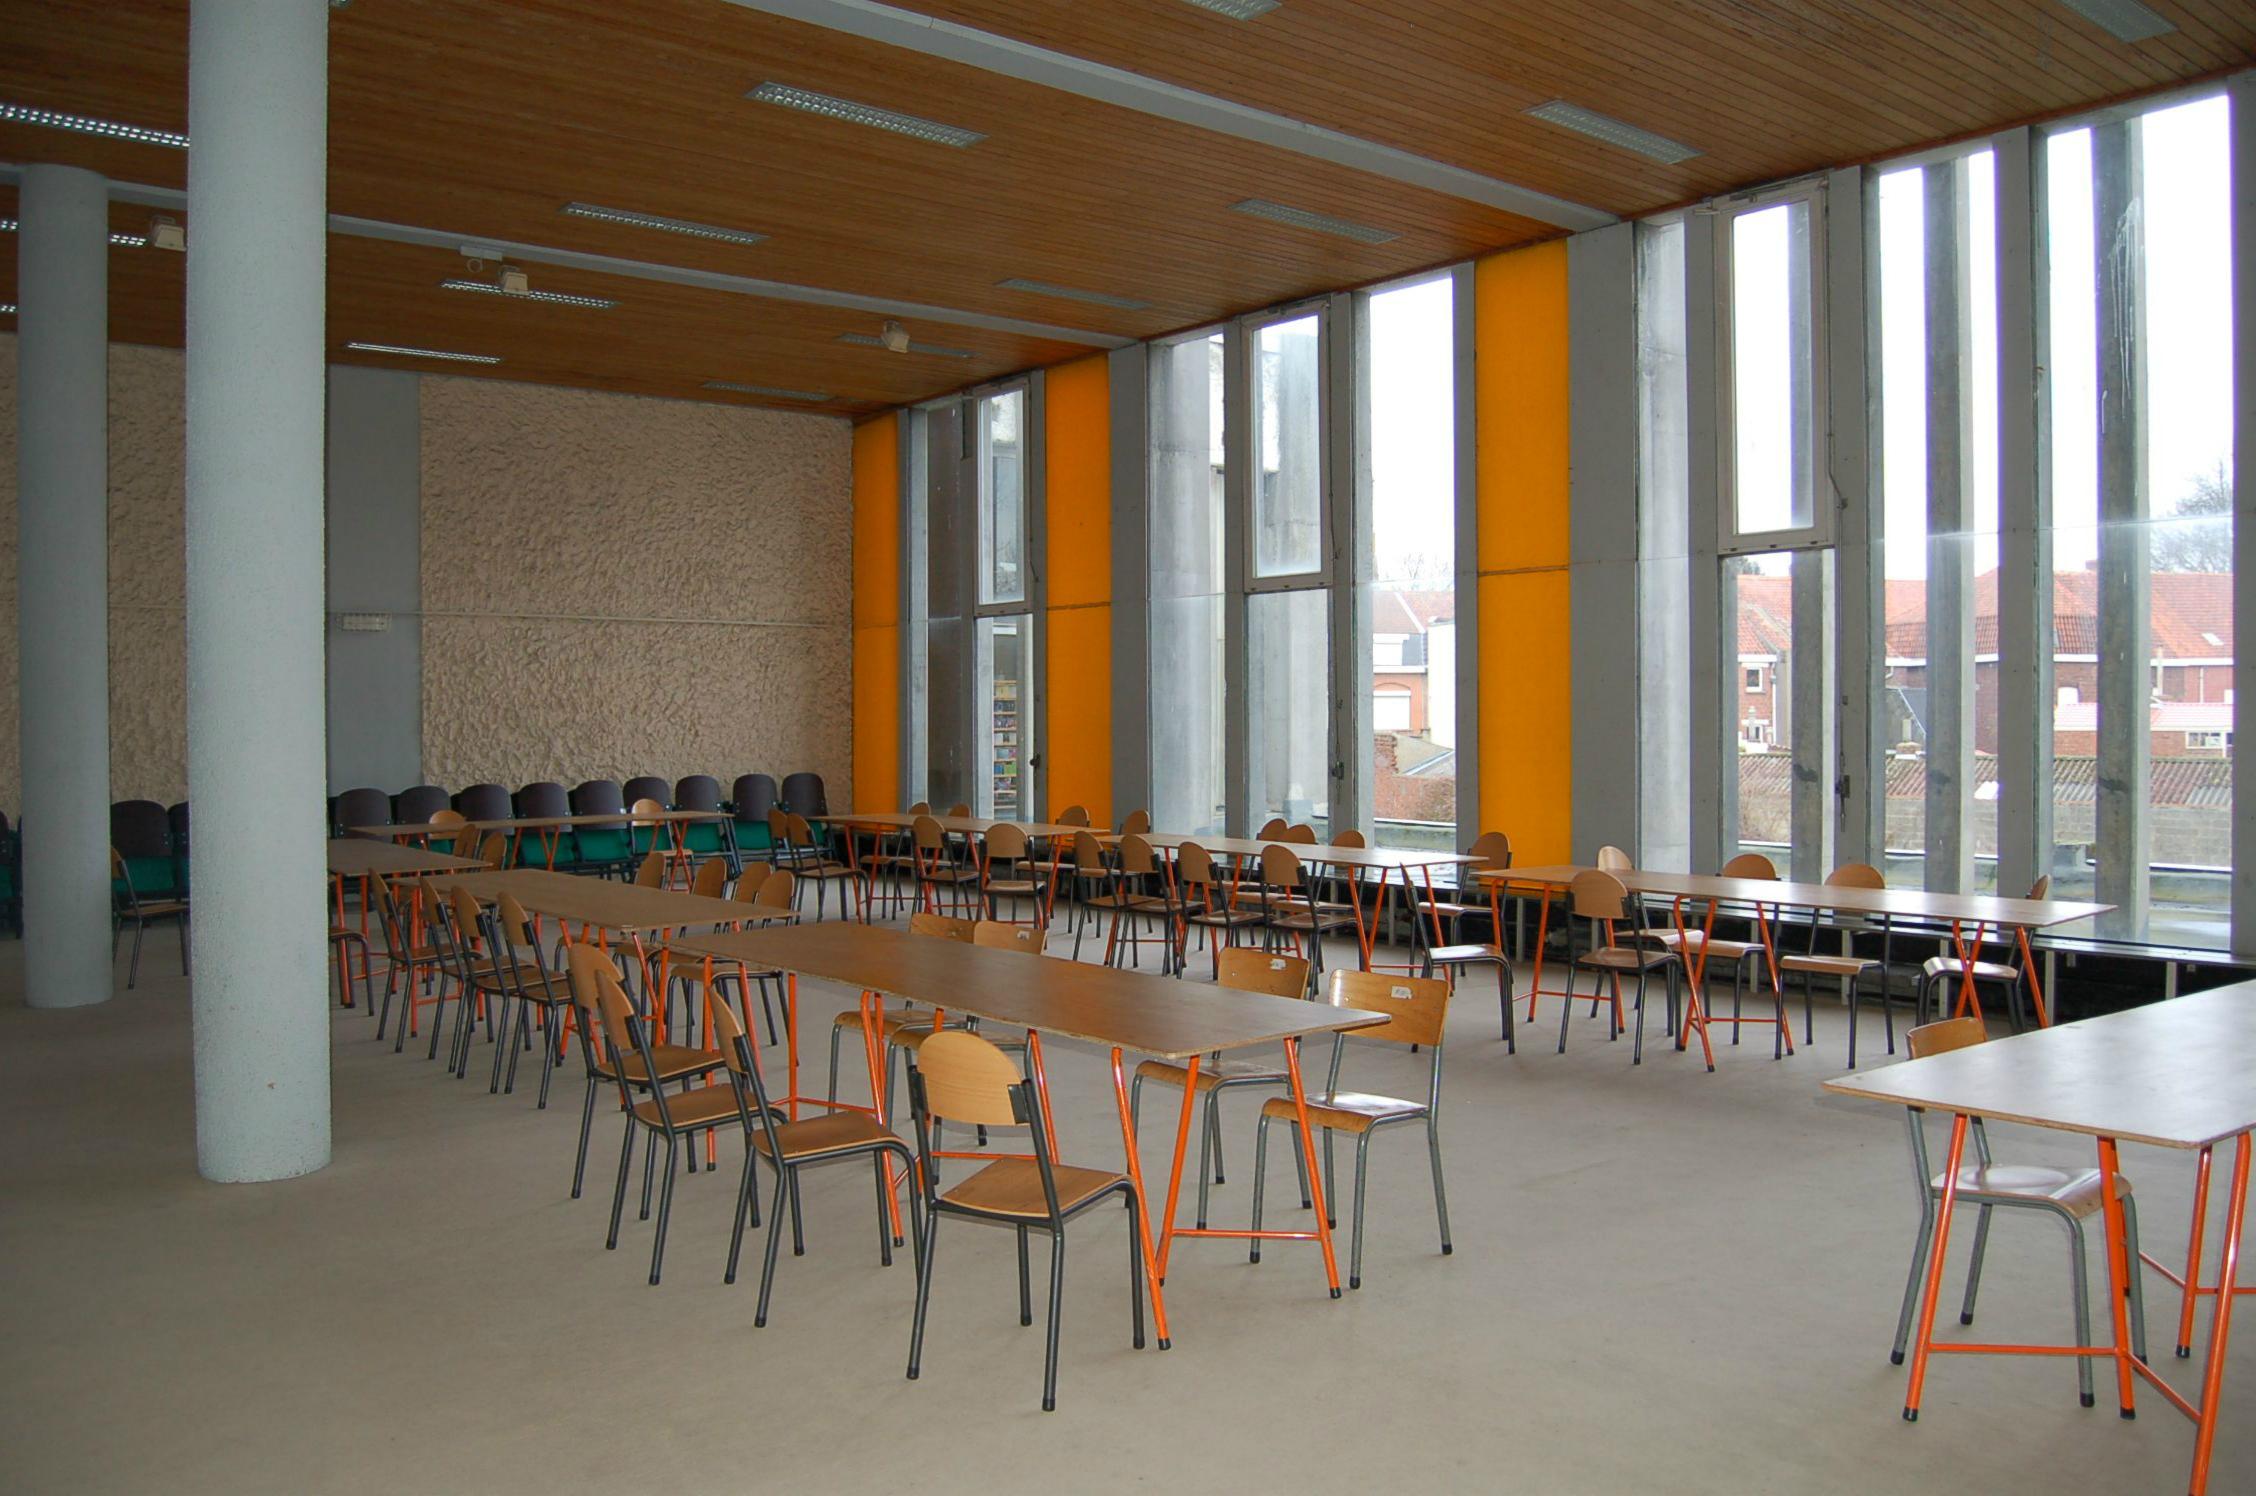 salle2 (9)_.JPG